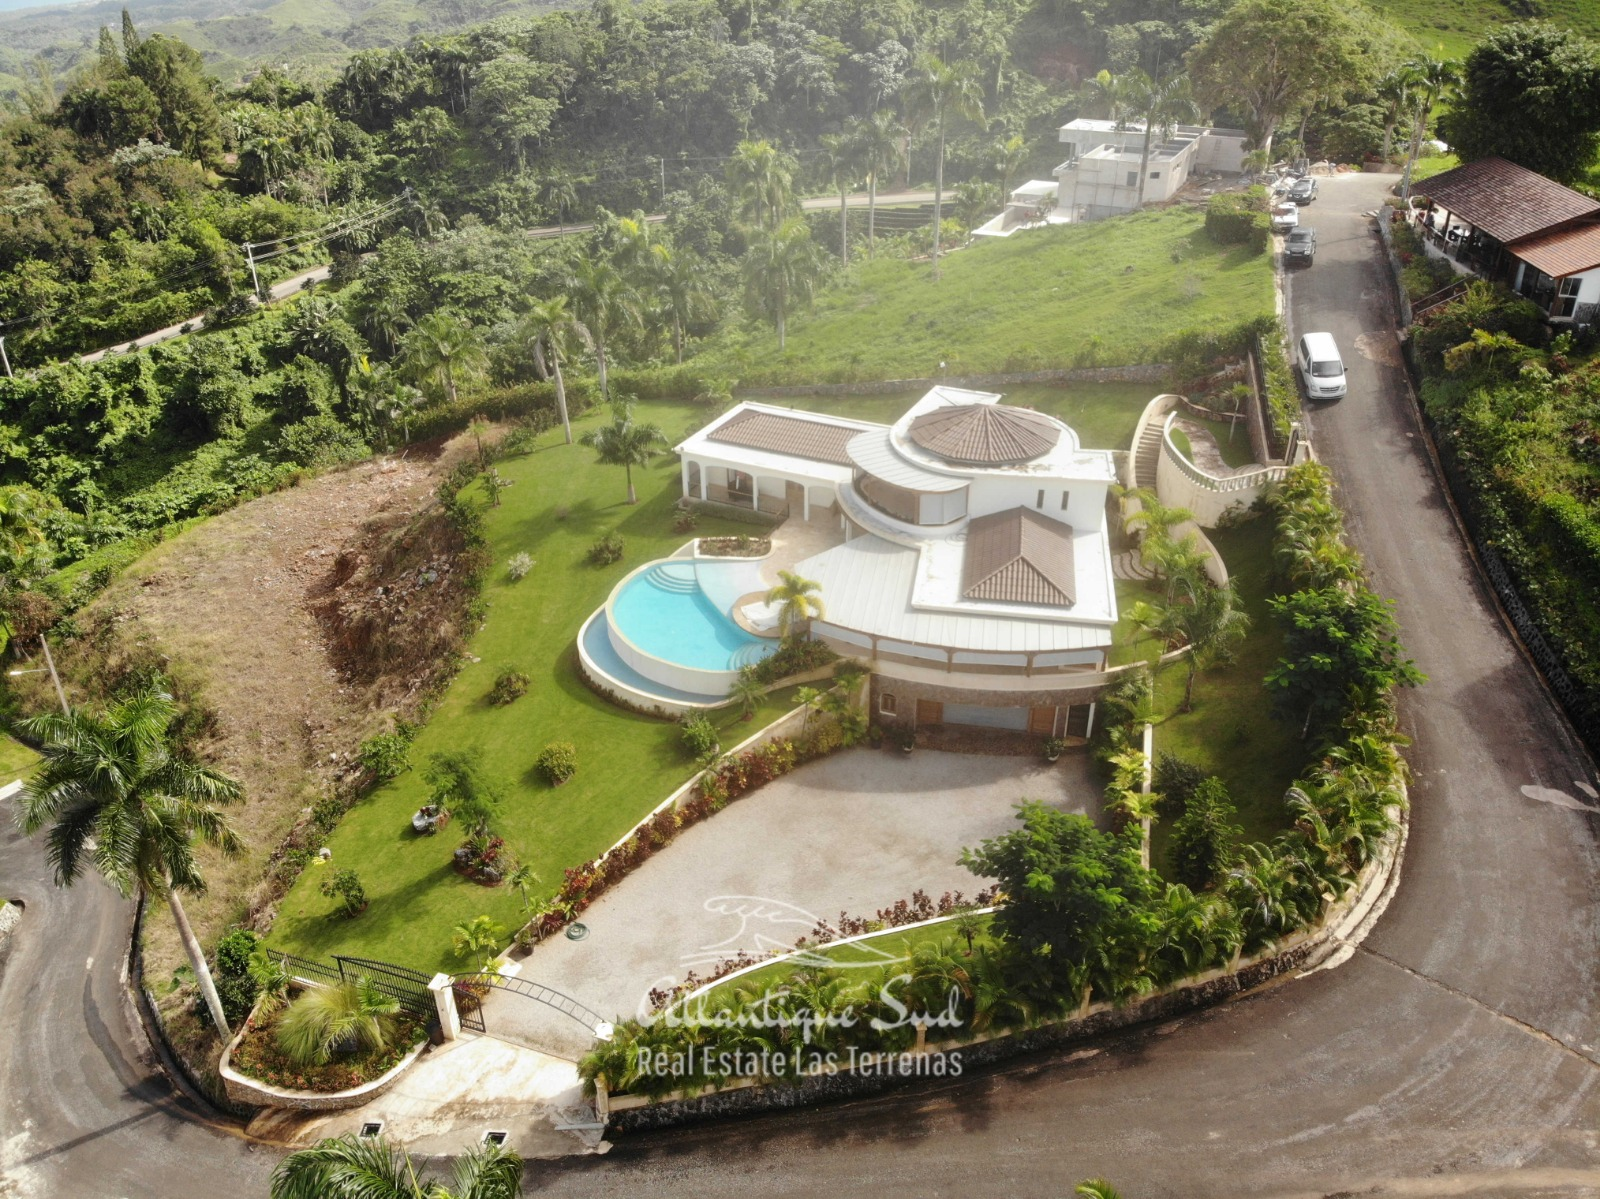 Hillside Lots for sale in Las Terrenas21.jpeg